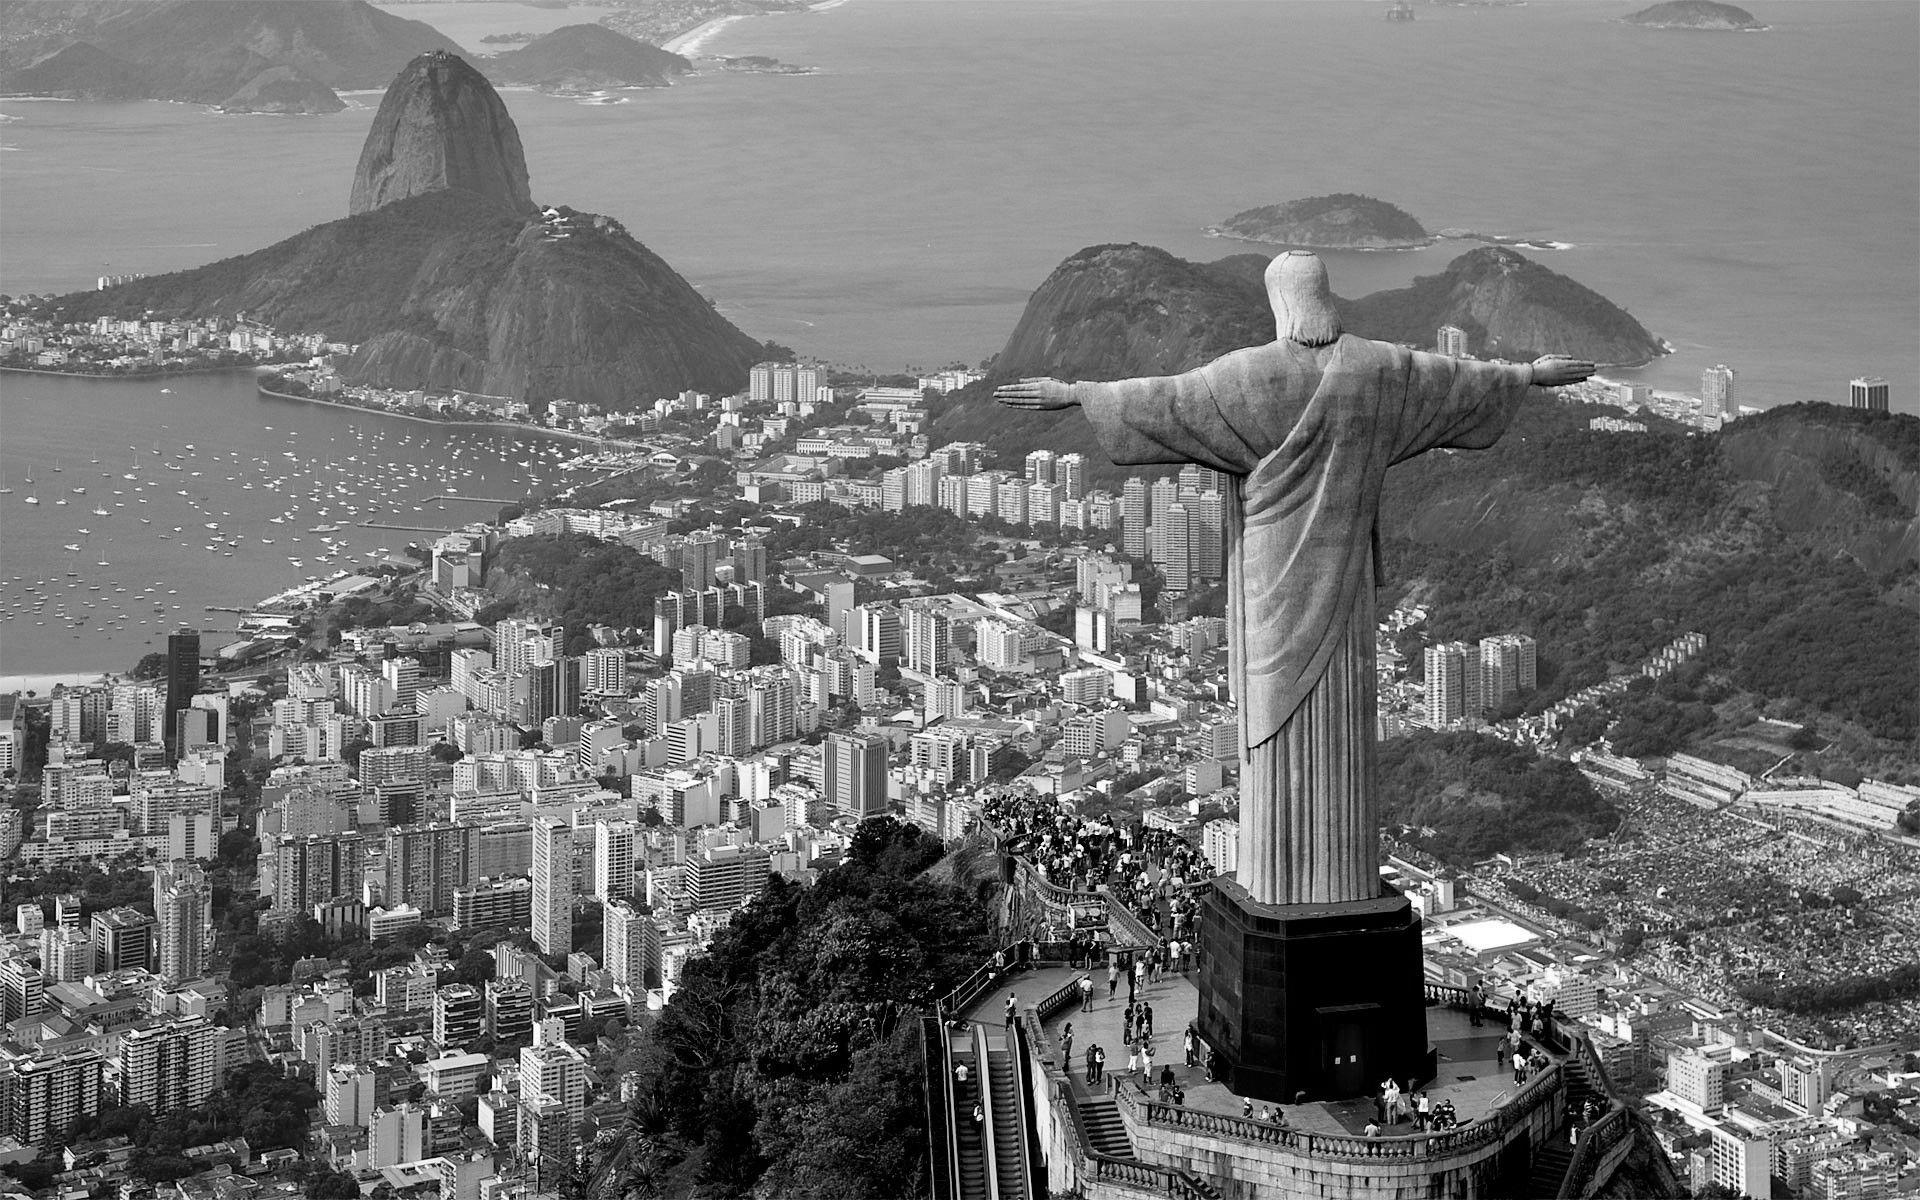 Rio-City-Desktop-Wallpaper-08951.jpg